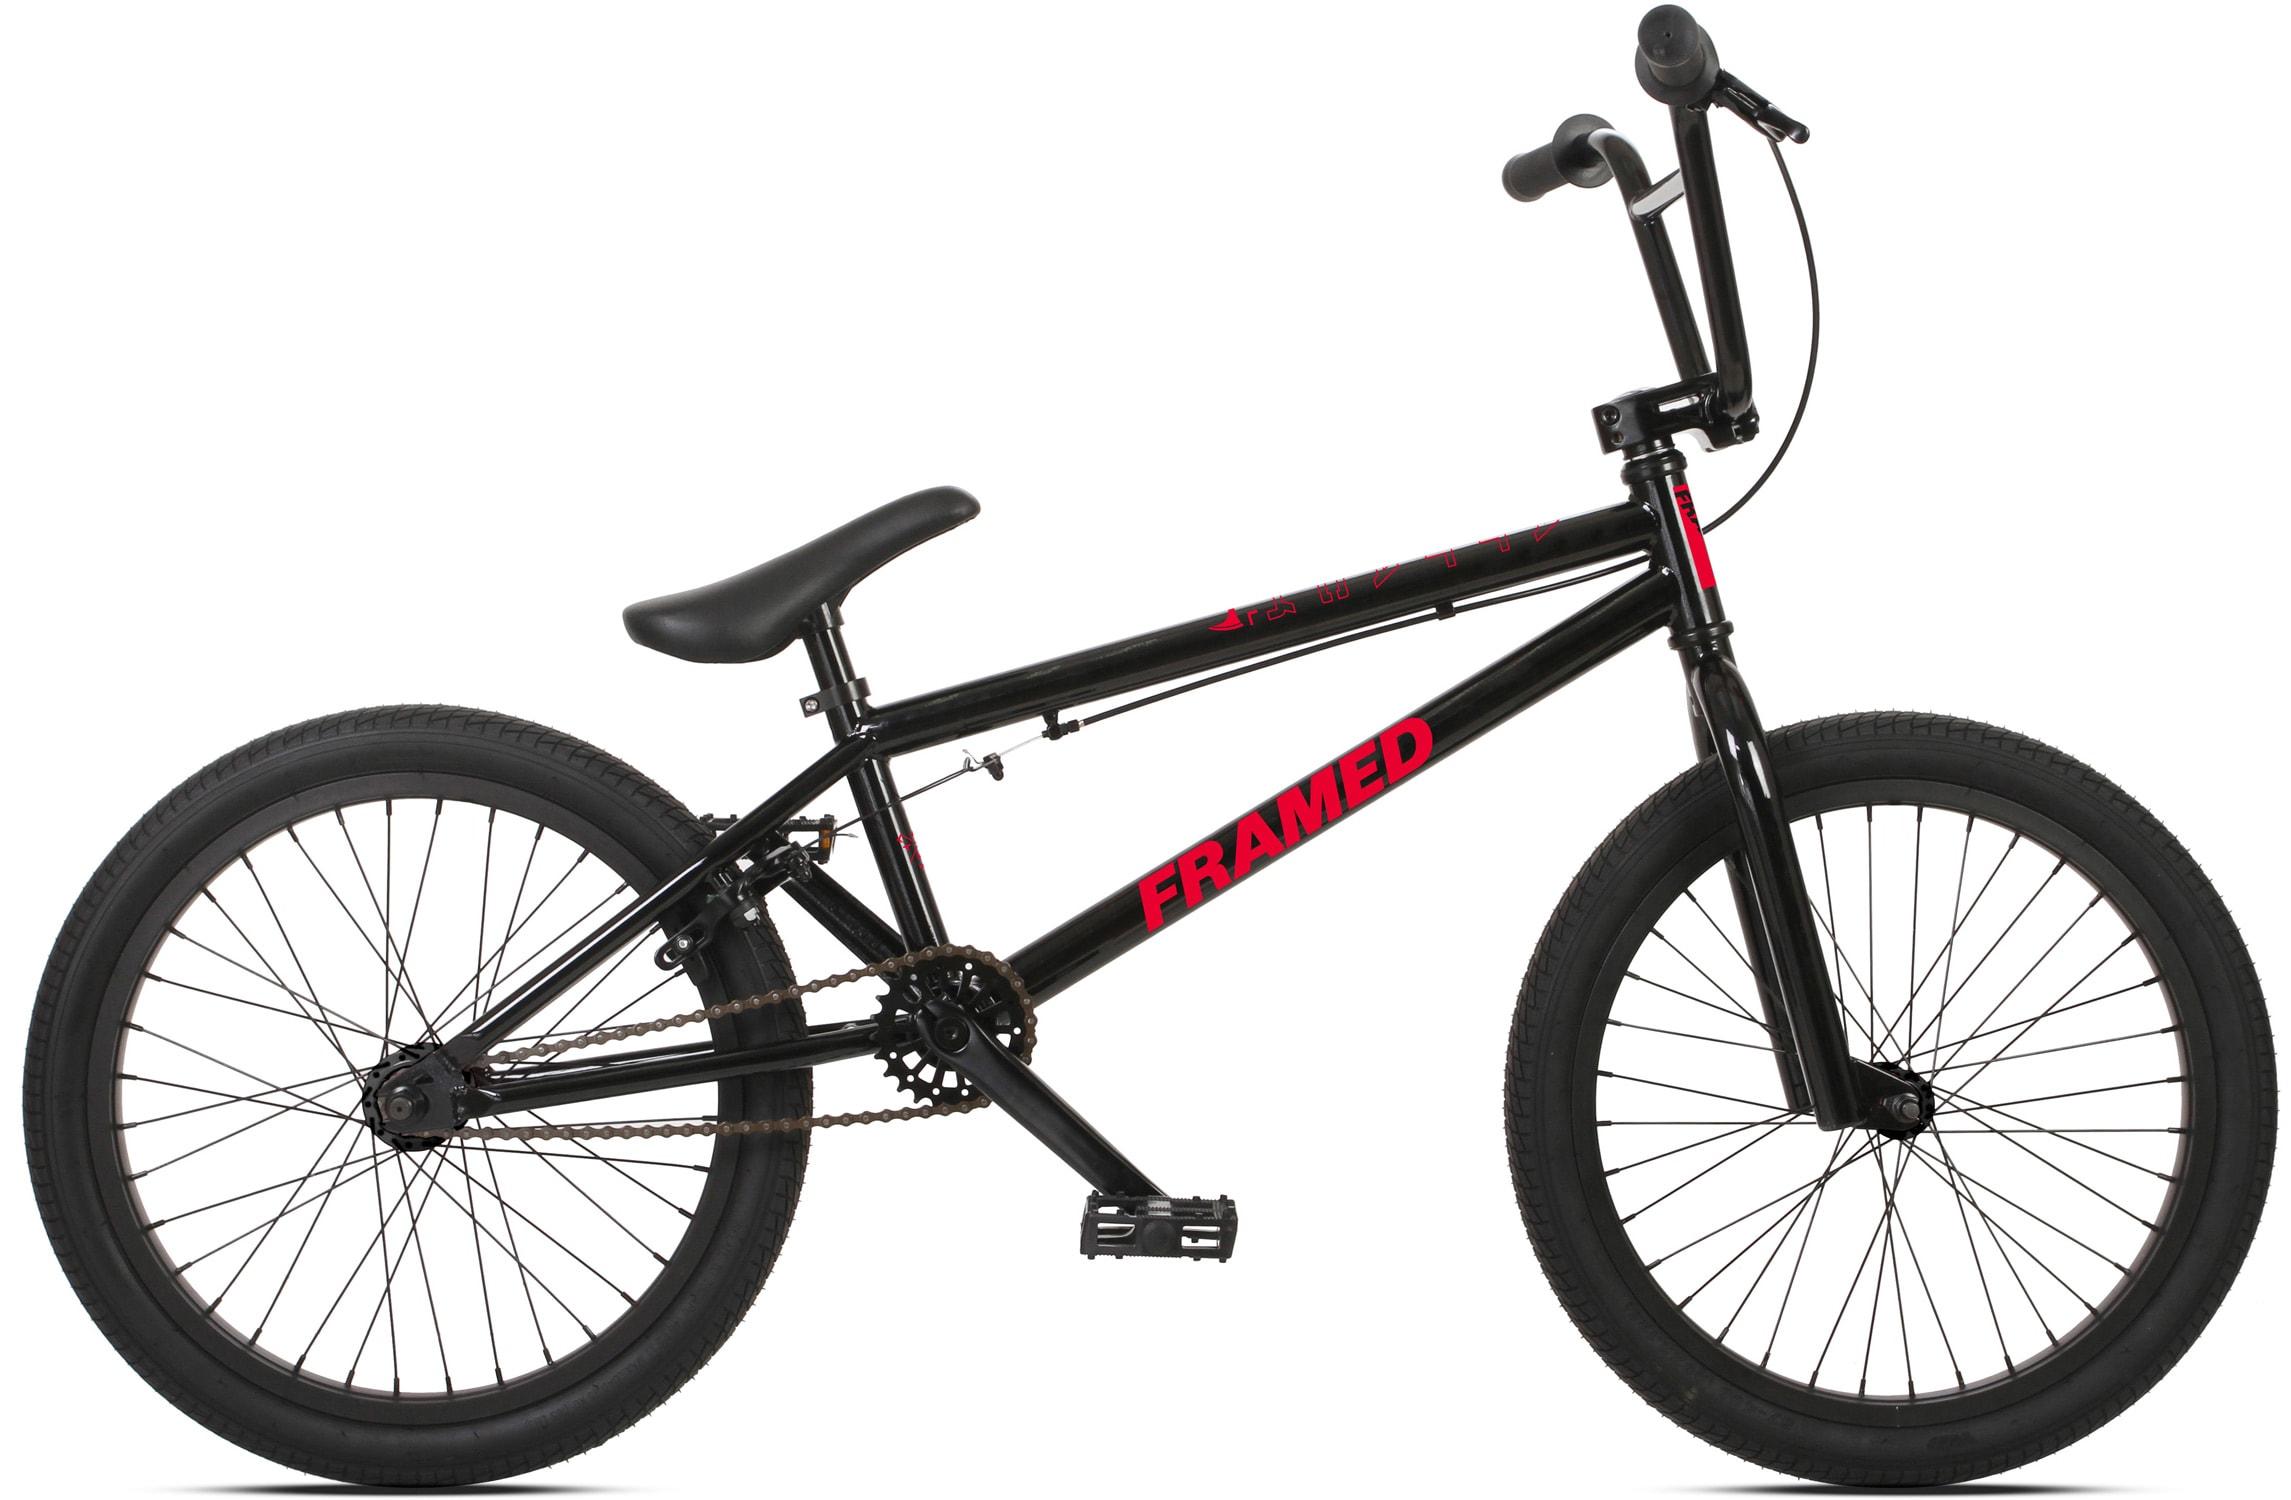 On Sale Framed Attack Xl Bmx Bike Up To 40 Off